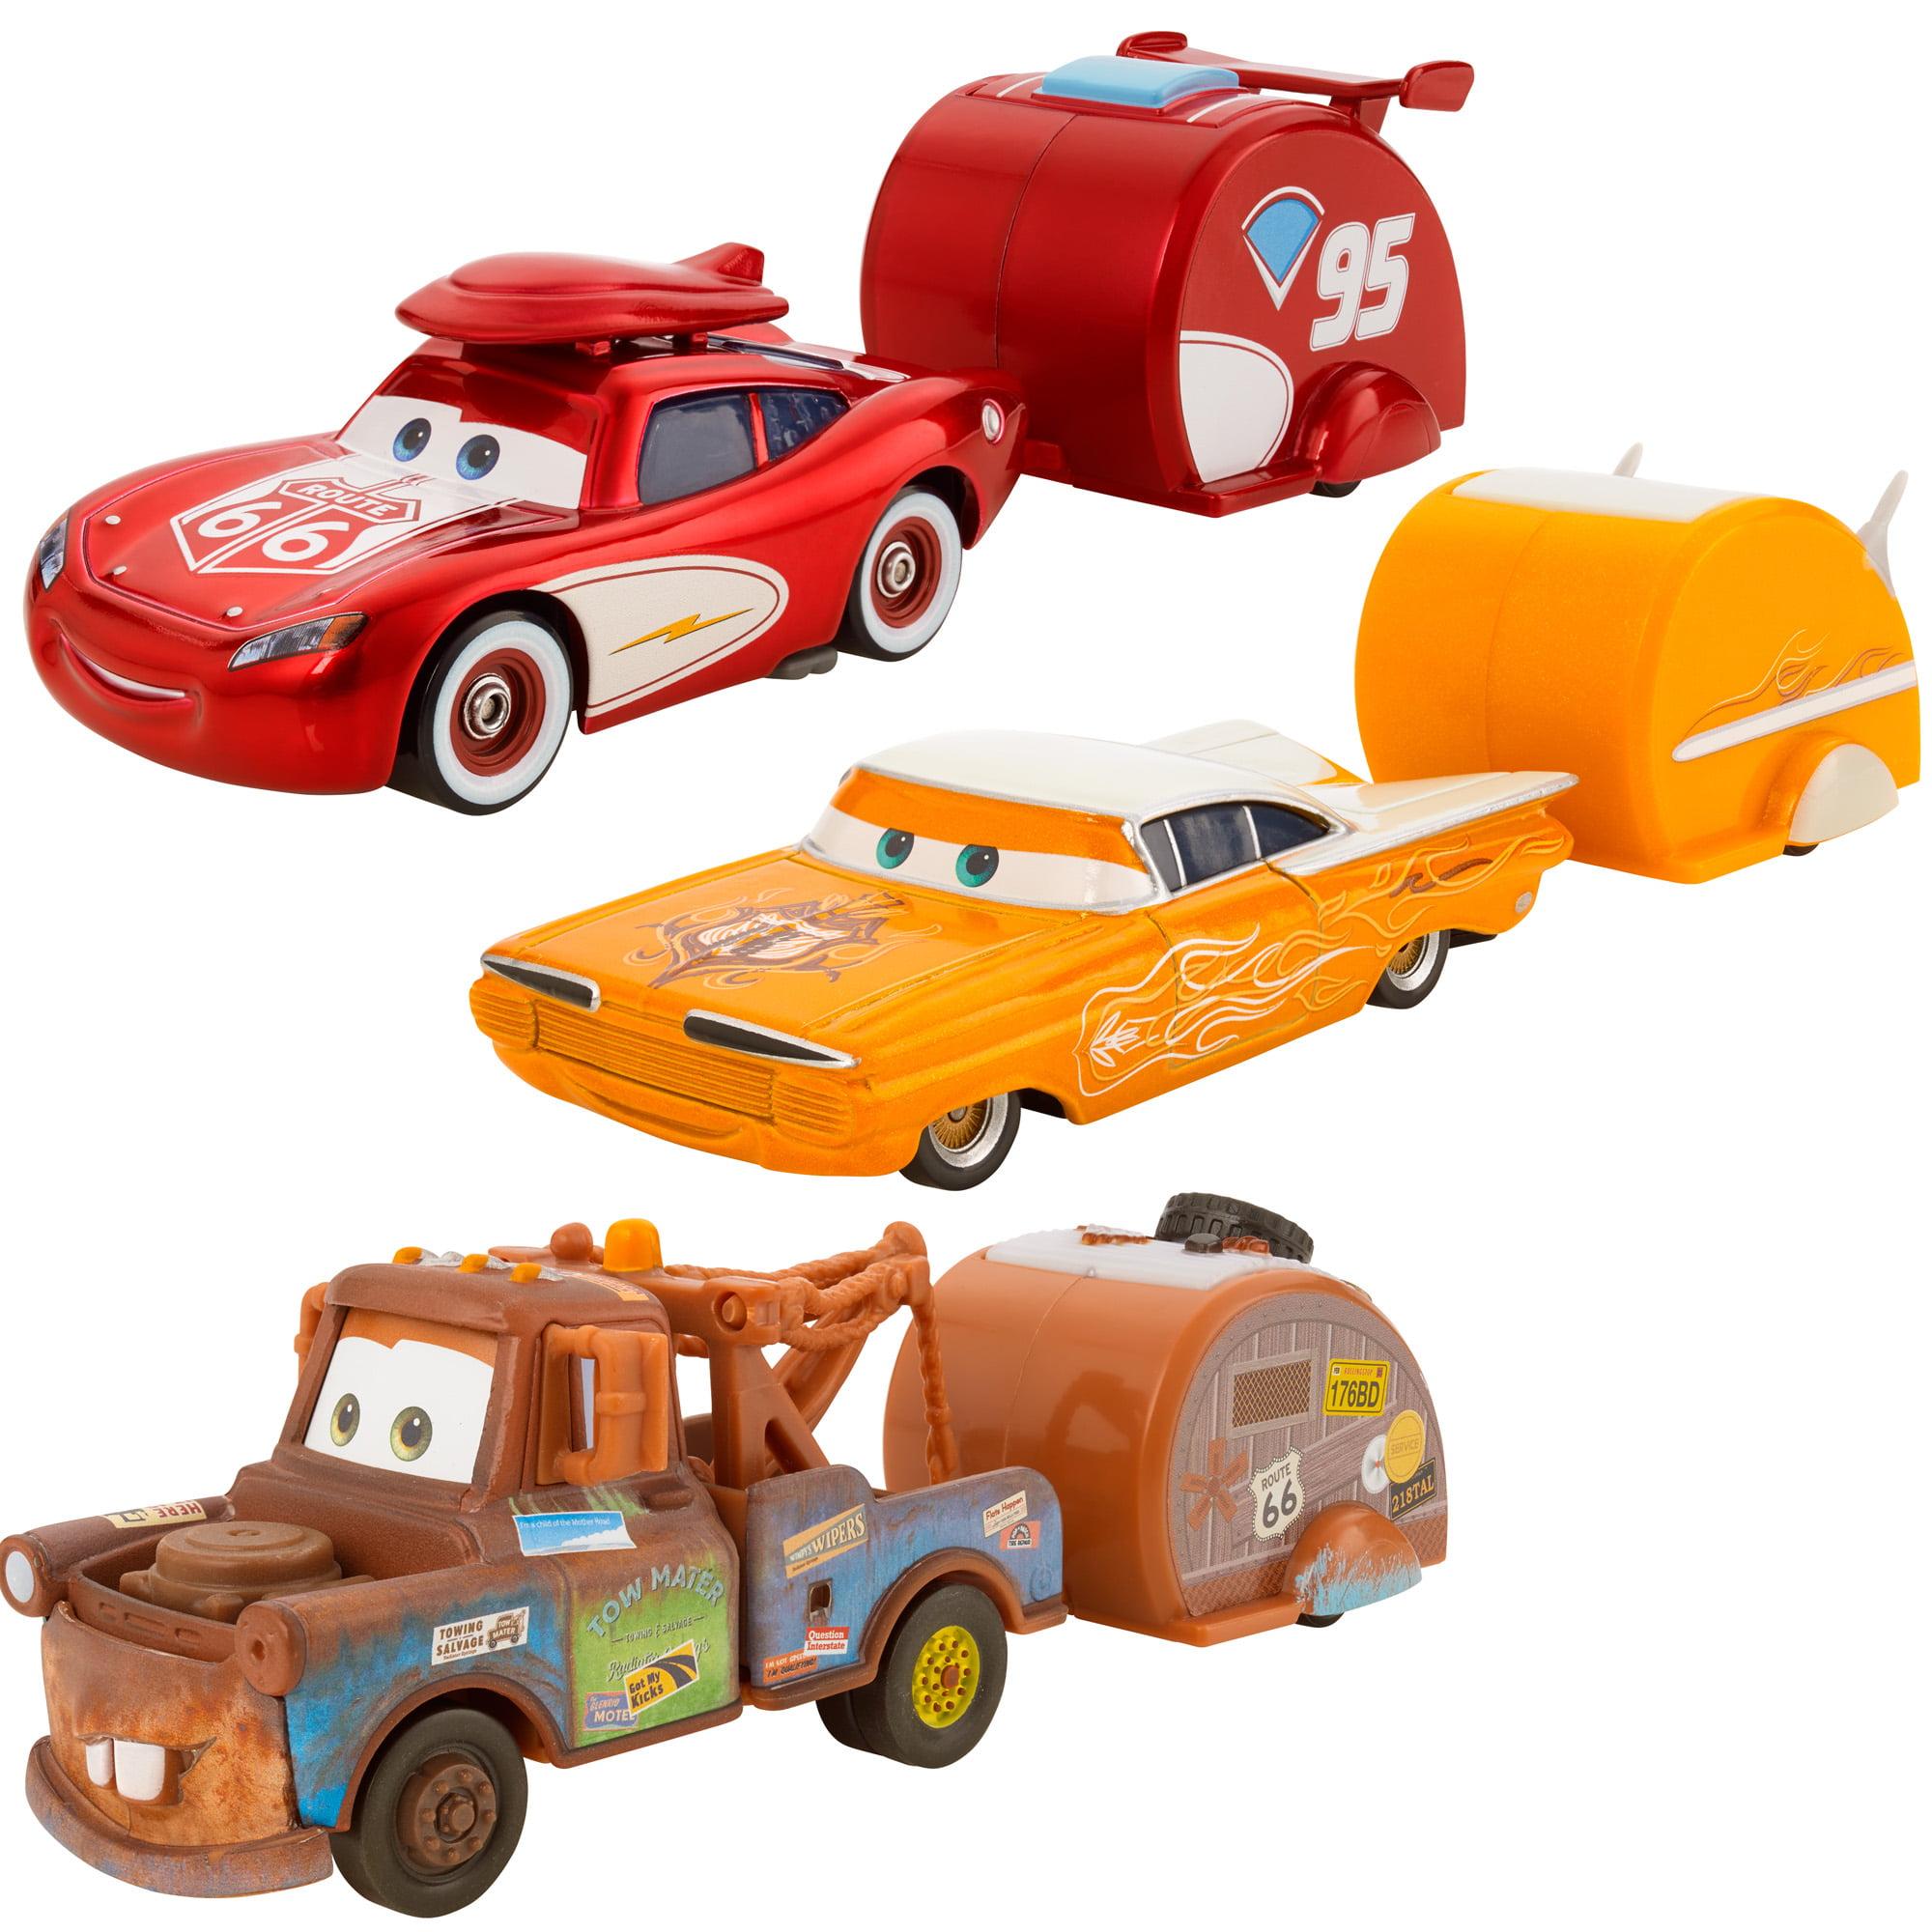 Disney/Pixar Cars RDTR1P Die-Cast Vehicle and Trailer Assortment ...